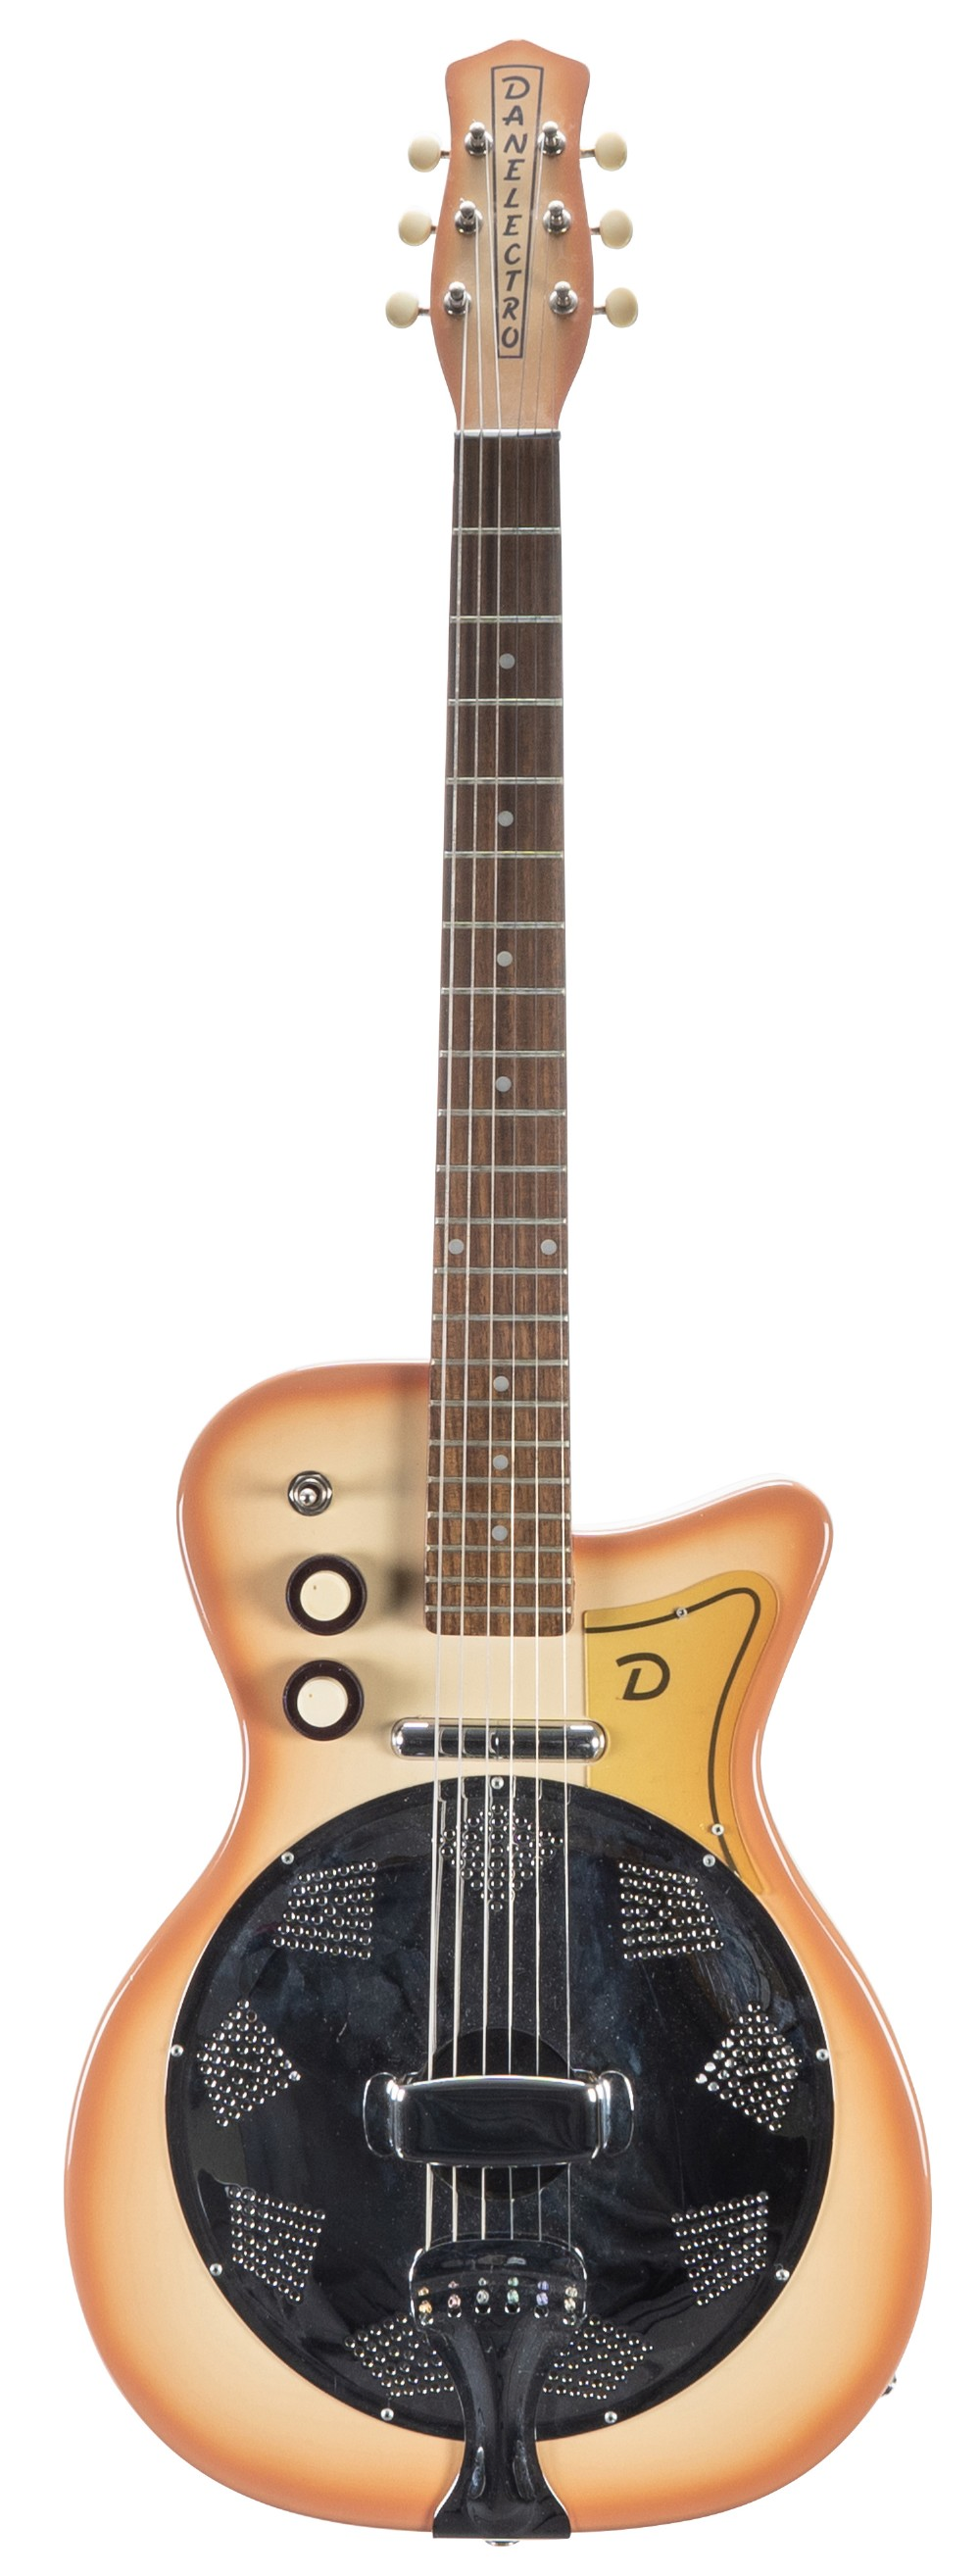 1990s Danelectro Resodan electric resonator guitar; Finish: coral burst; Fretboard: rosewood; Frets: